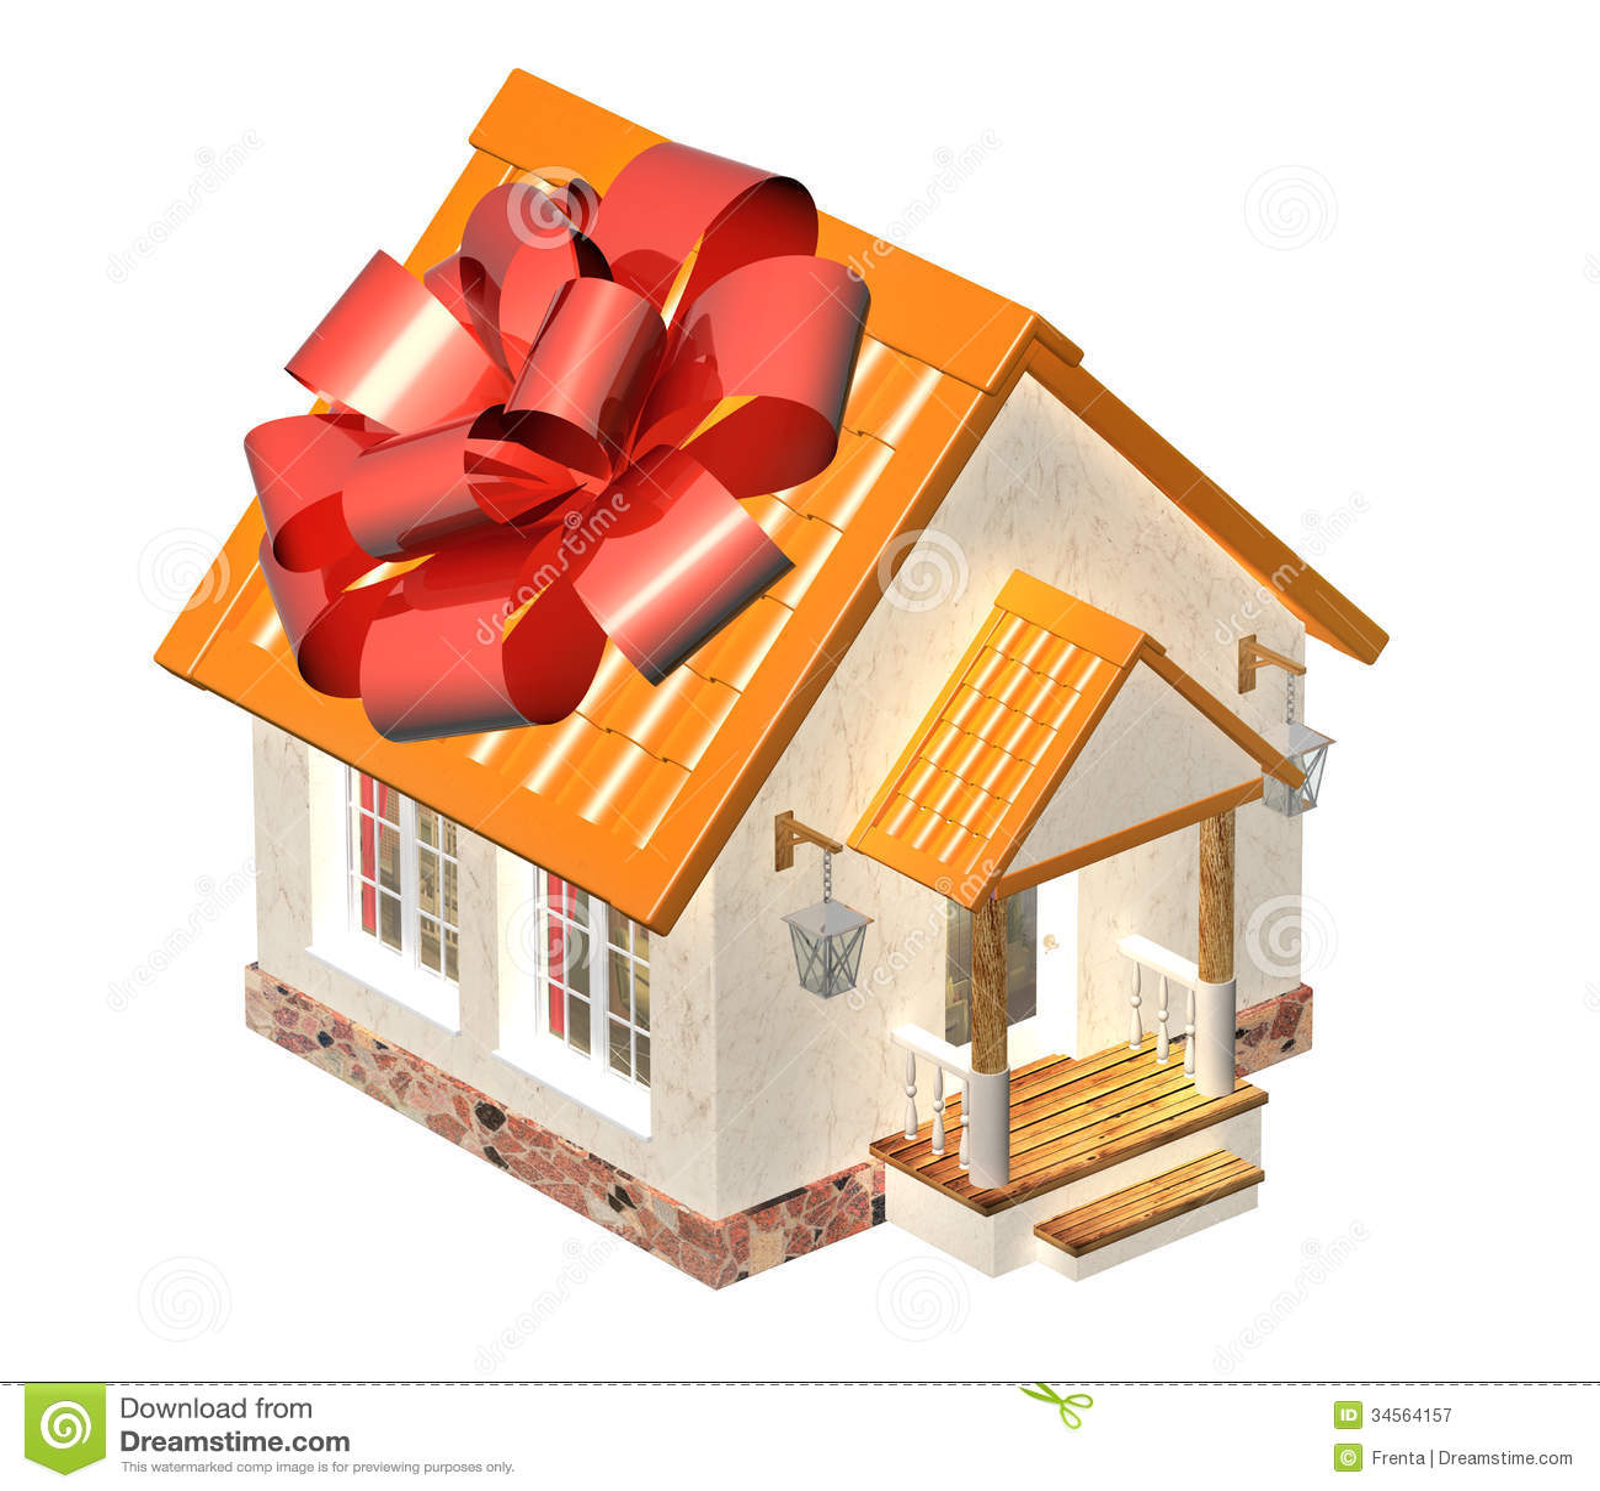 House gift royalty free stock photography image 34564157 - Regalos en casa ...